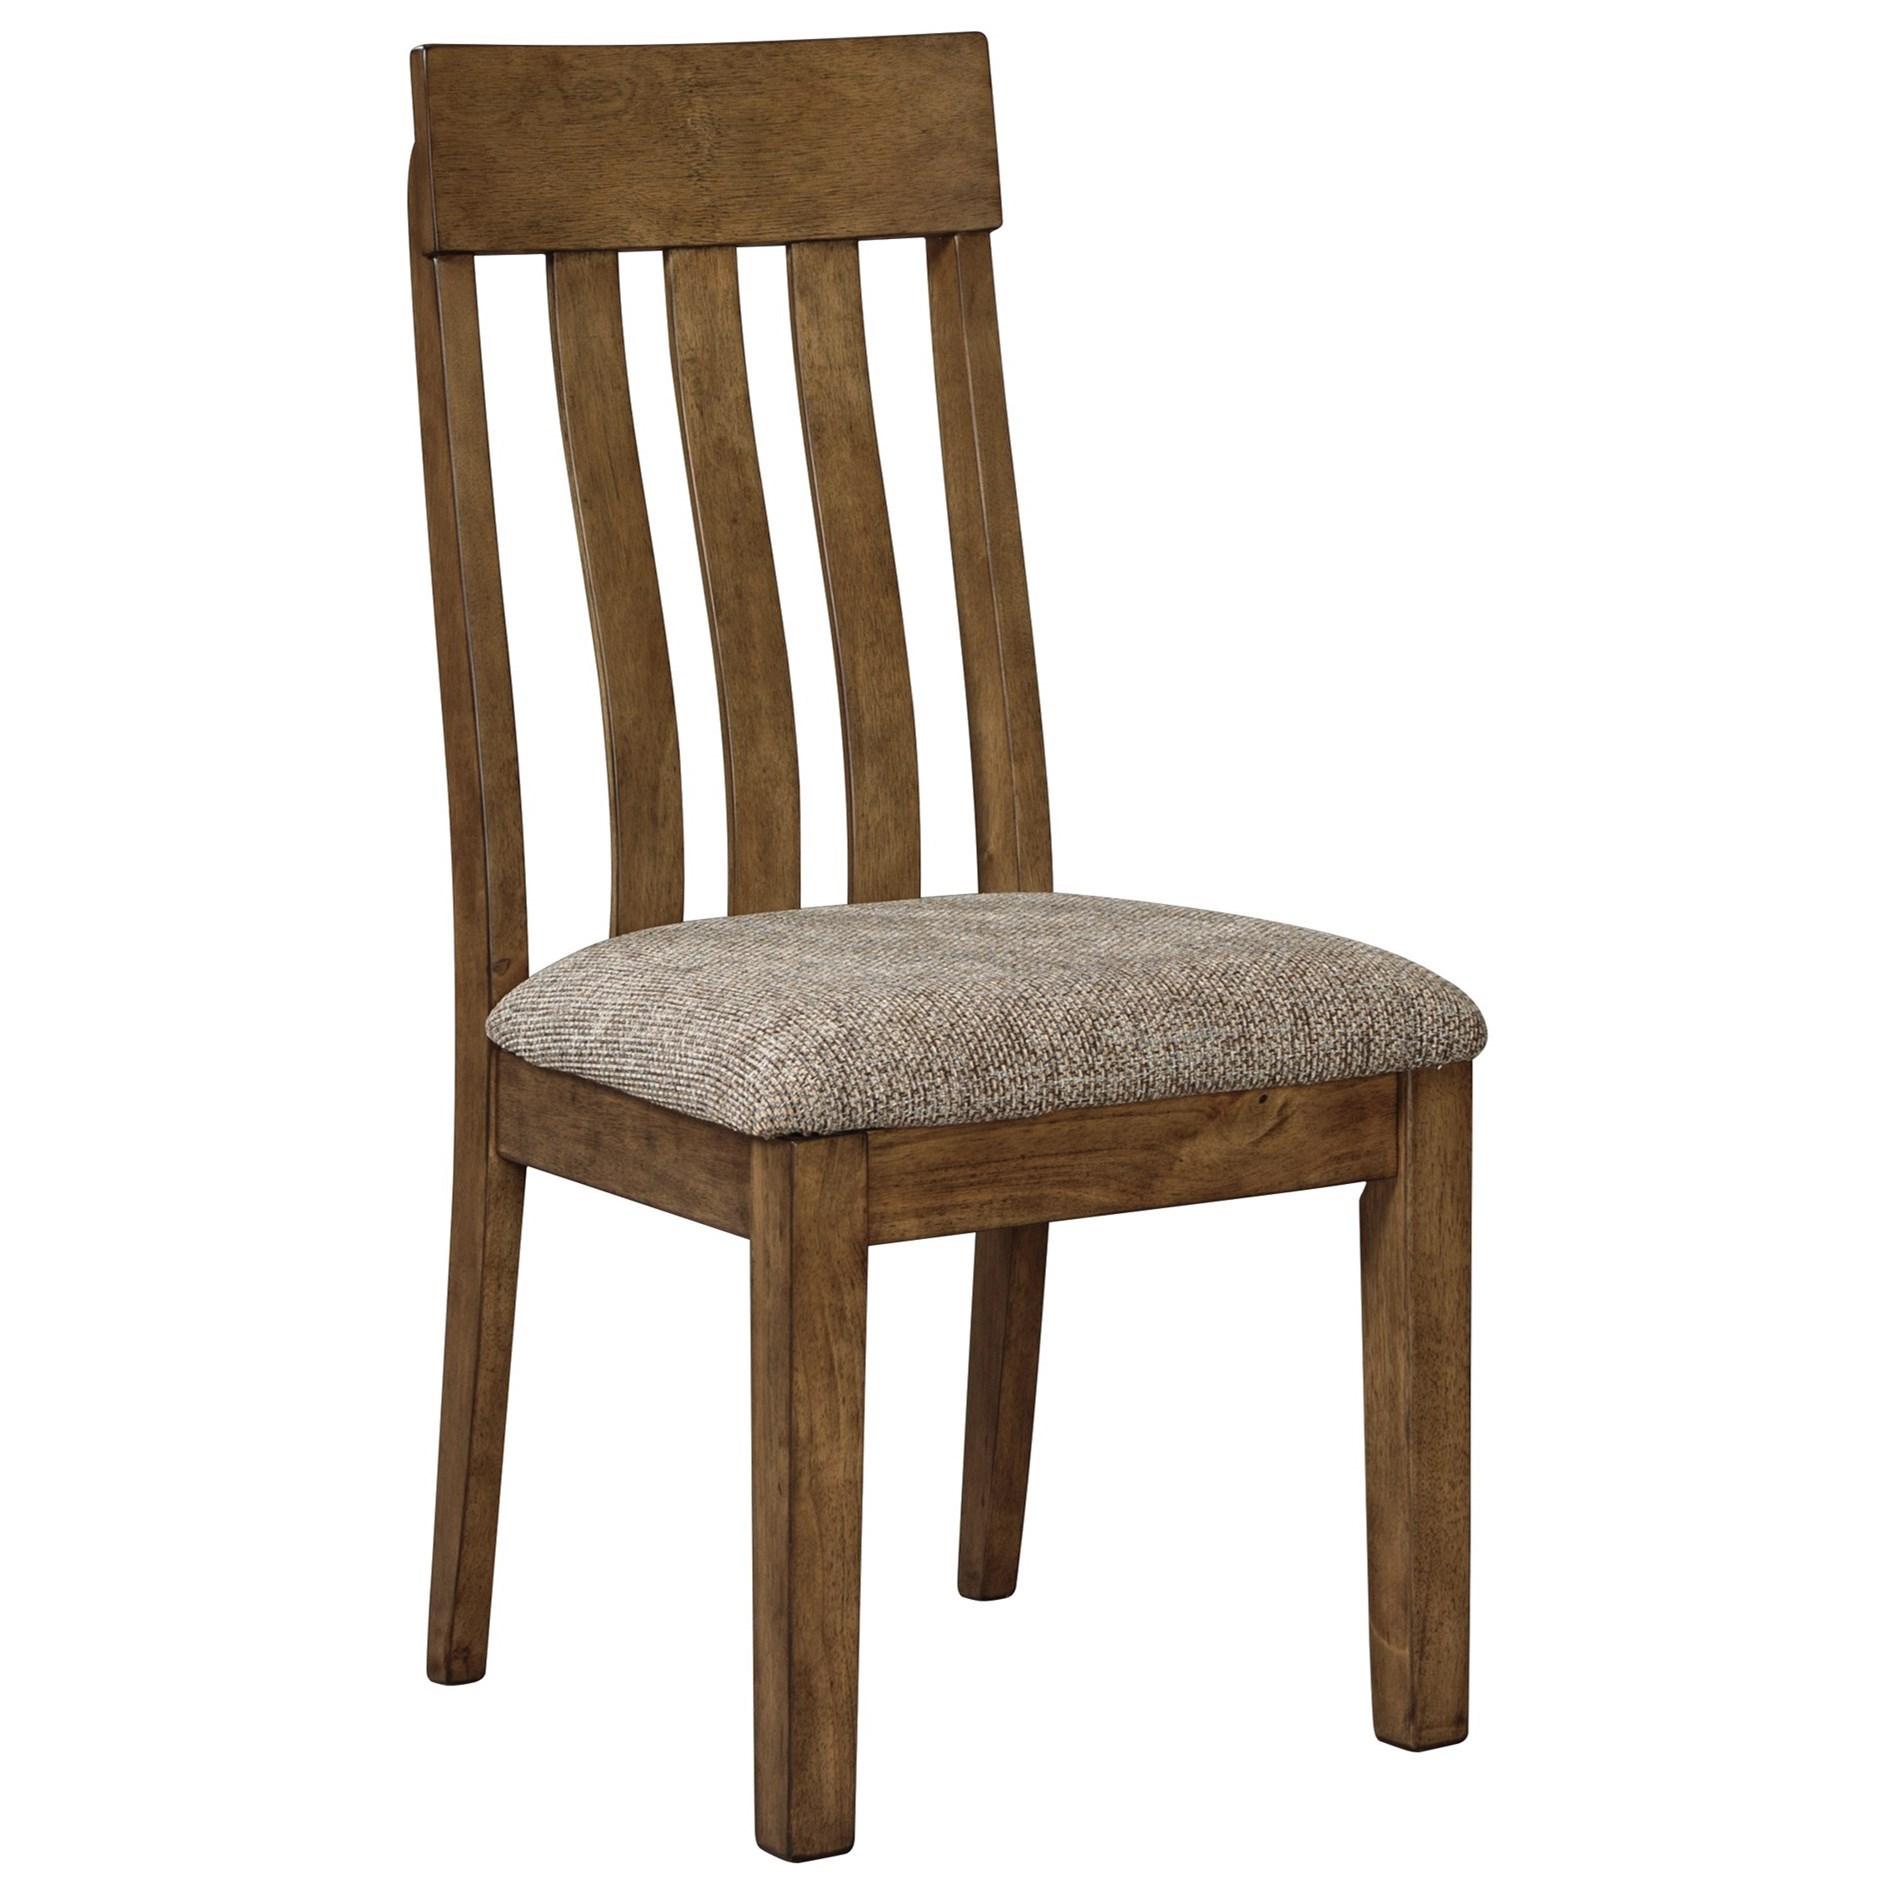 Levits Furniture: Benchcraft Flaybern D595-01 Dining Upholstered Slat Back